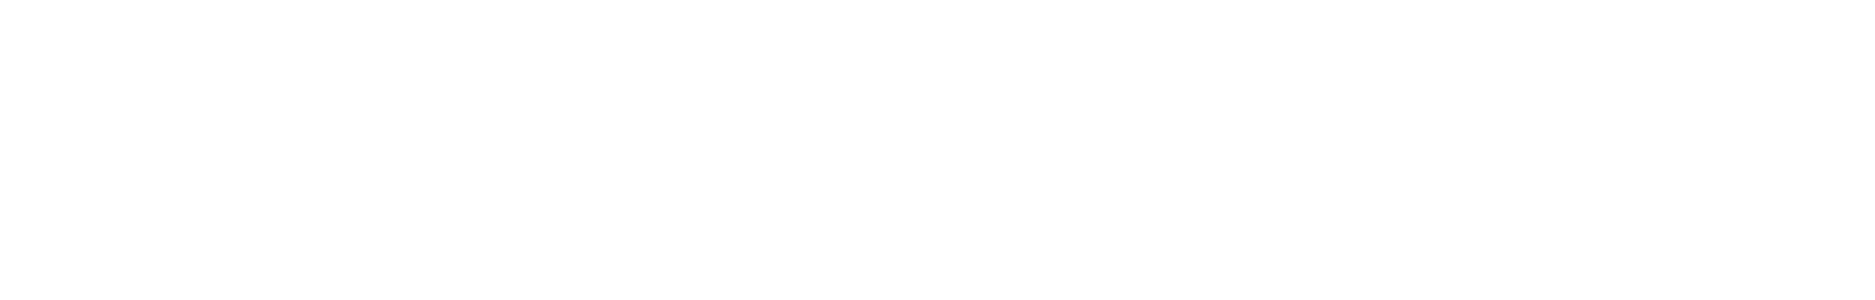 水蛭JogsLeech banner